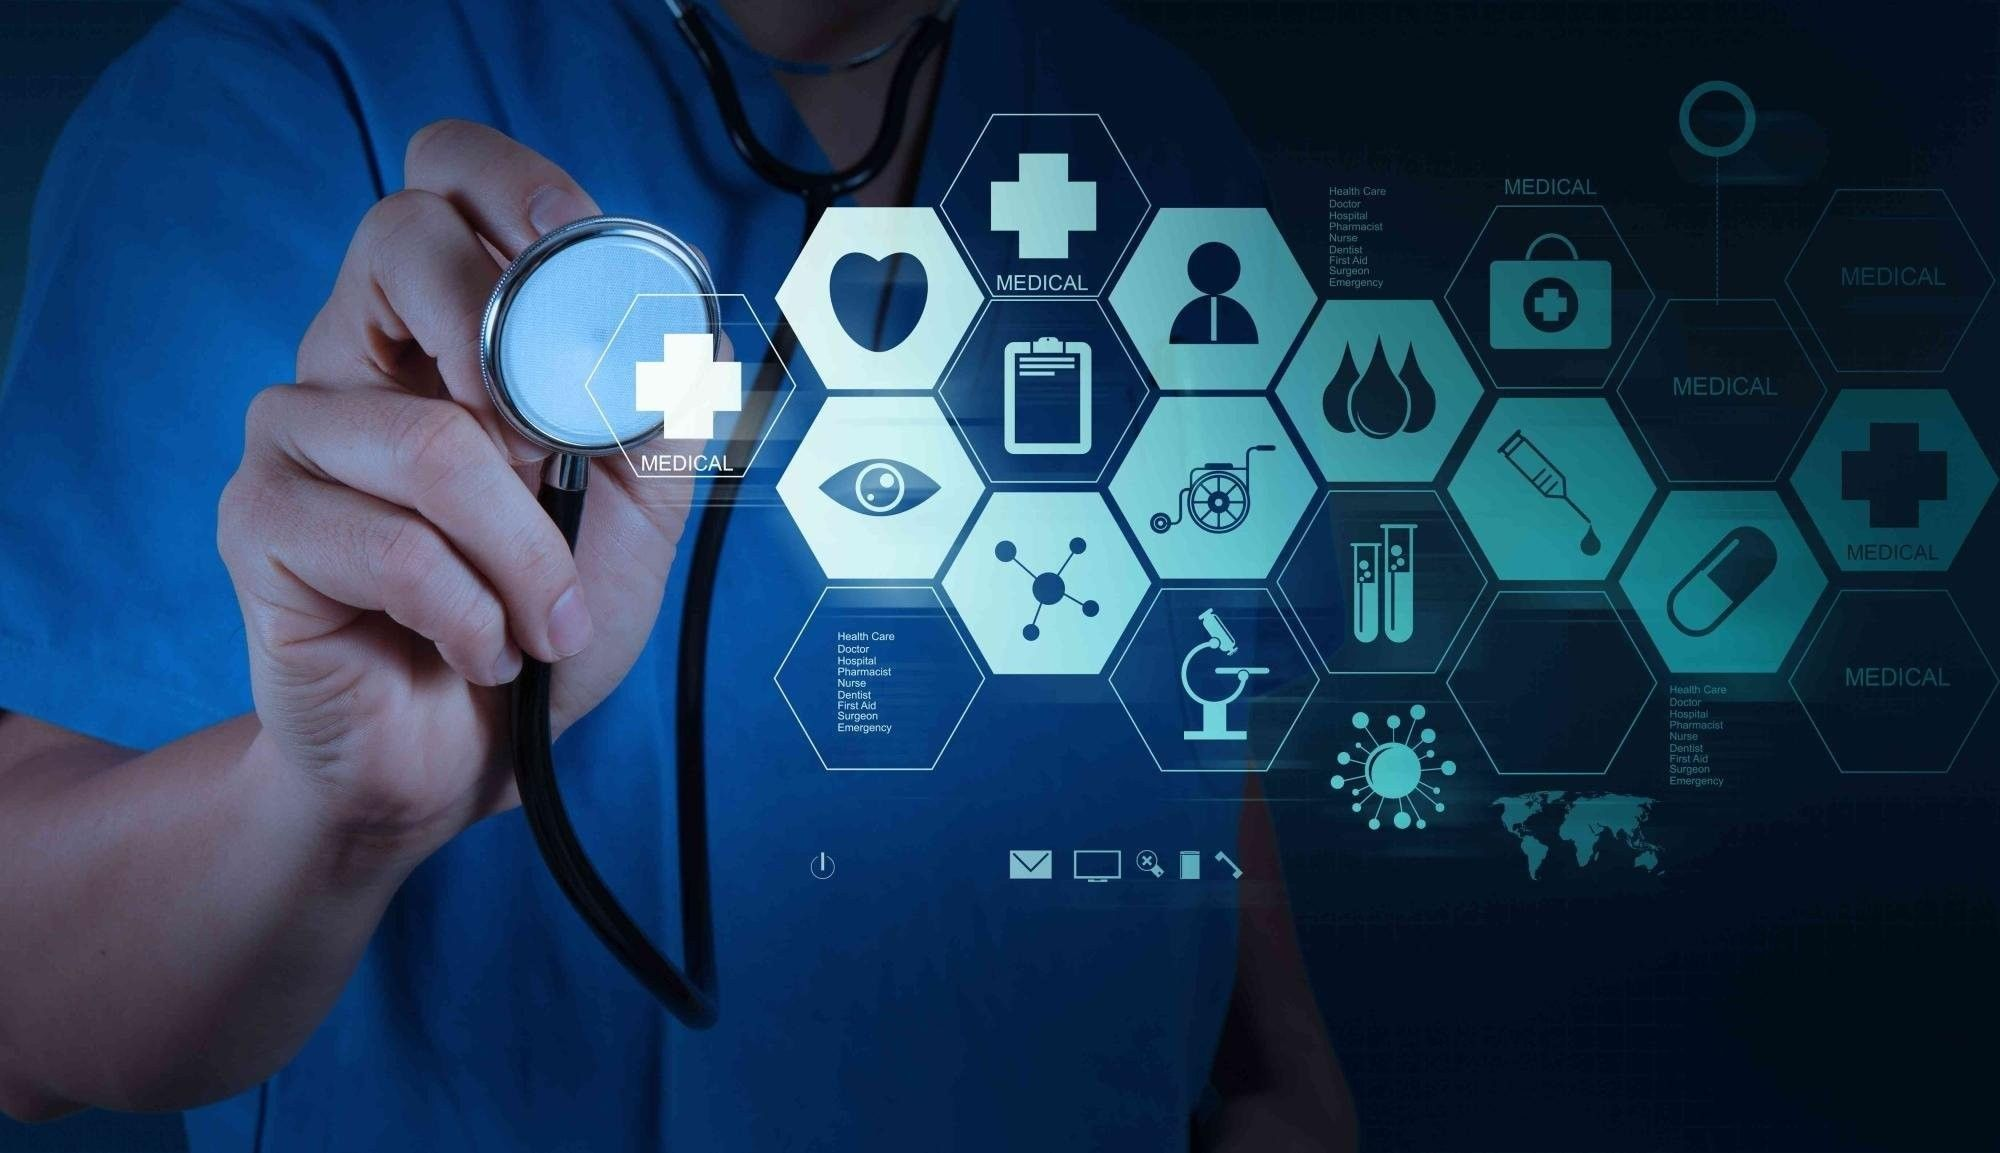 Res 2000x1153, Medical wallpaper ·â Download free